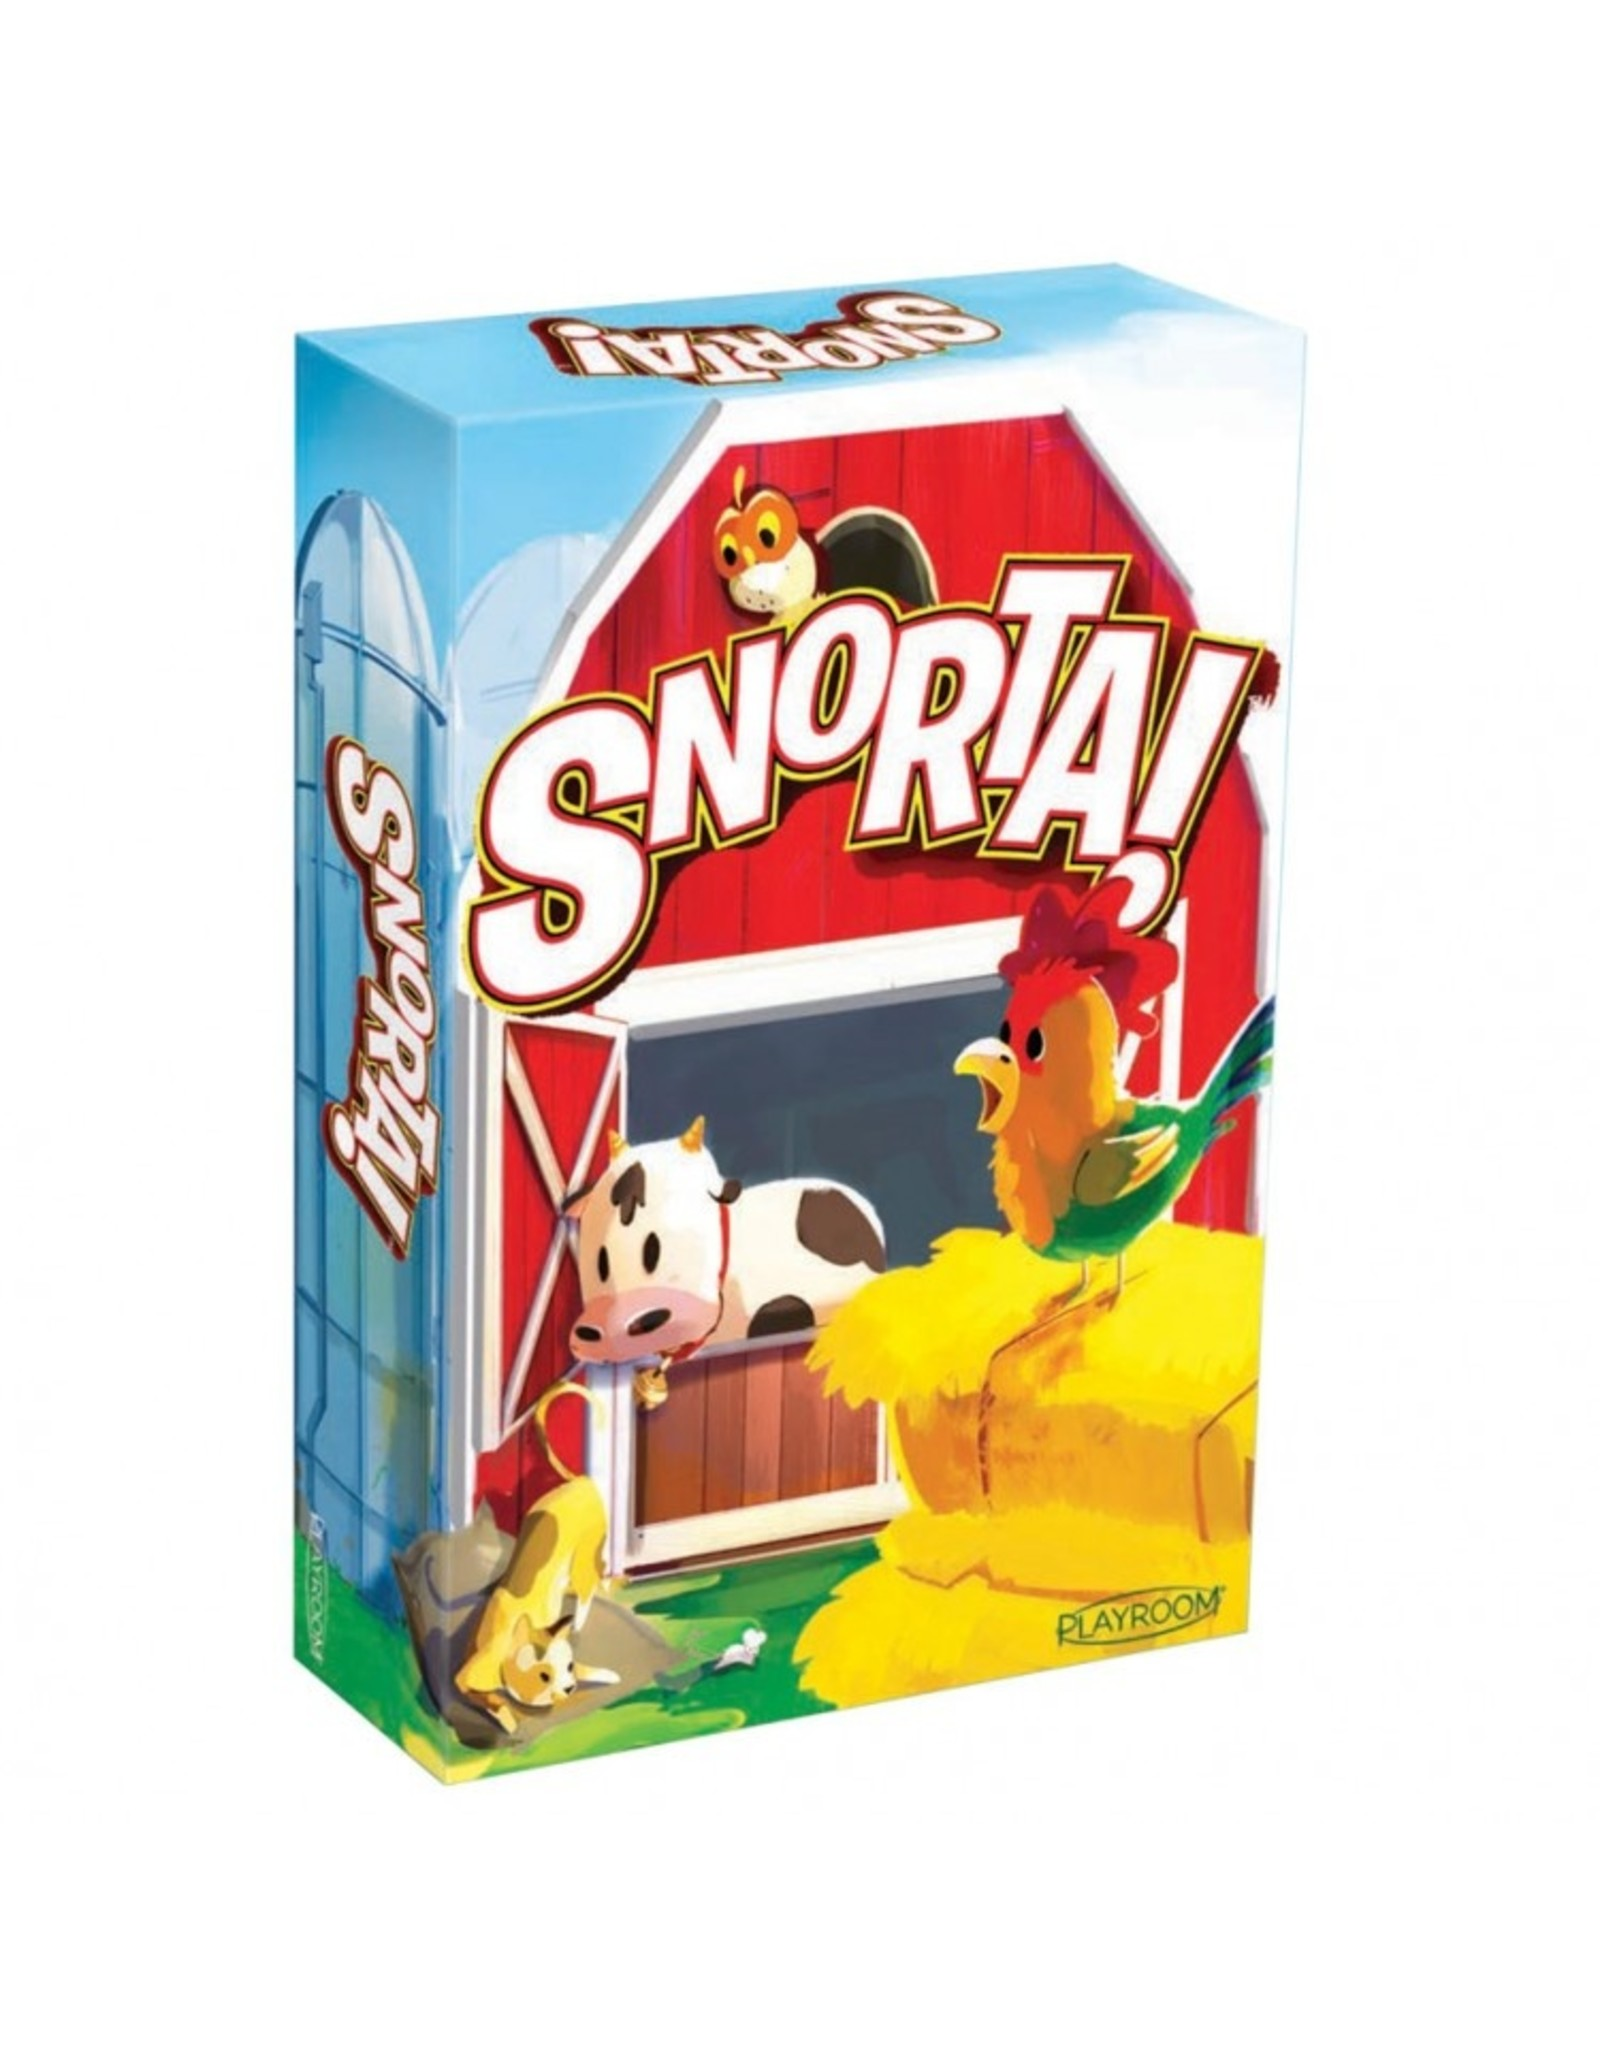 Playroom Entertainment Snorta!